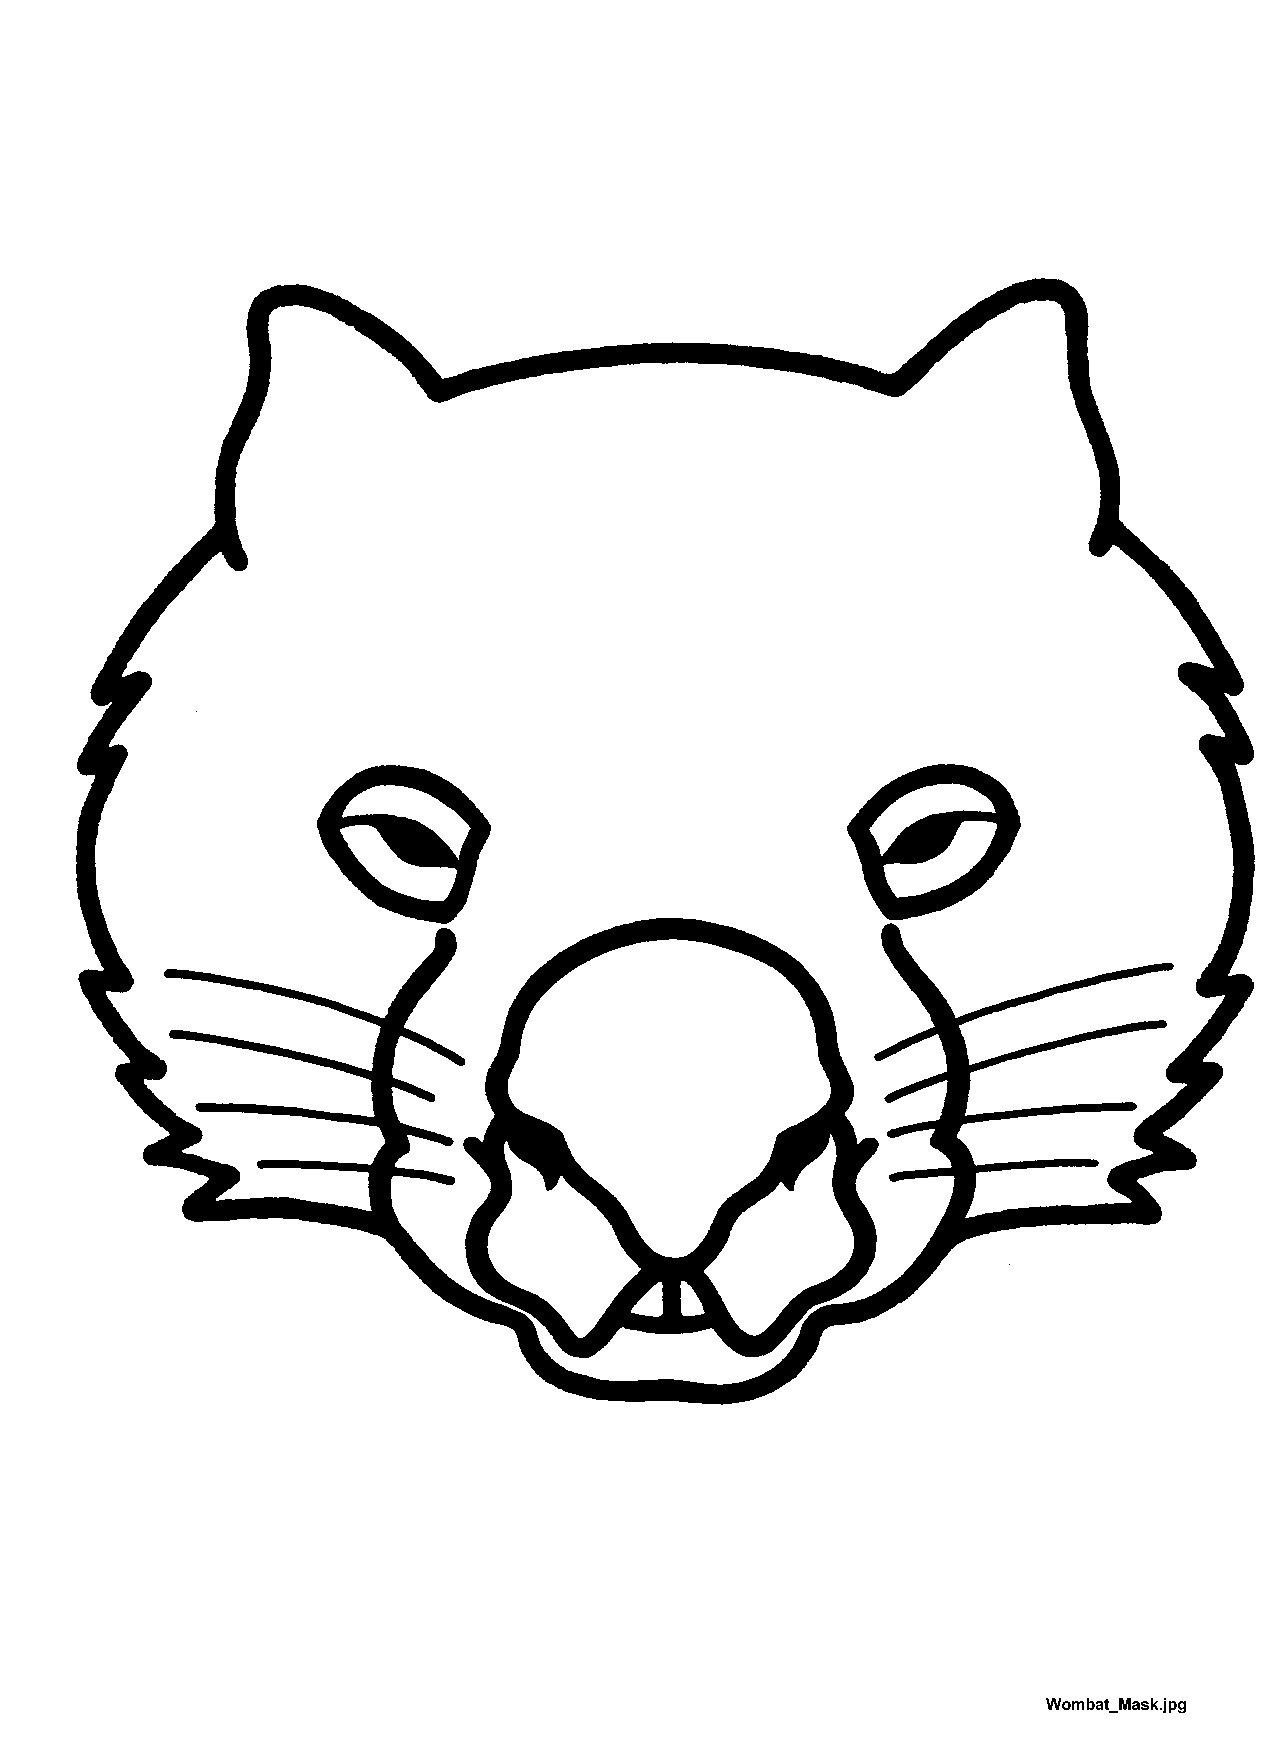 Wombat clipart australian possum Wombat ideas Australian jpg Stew